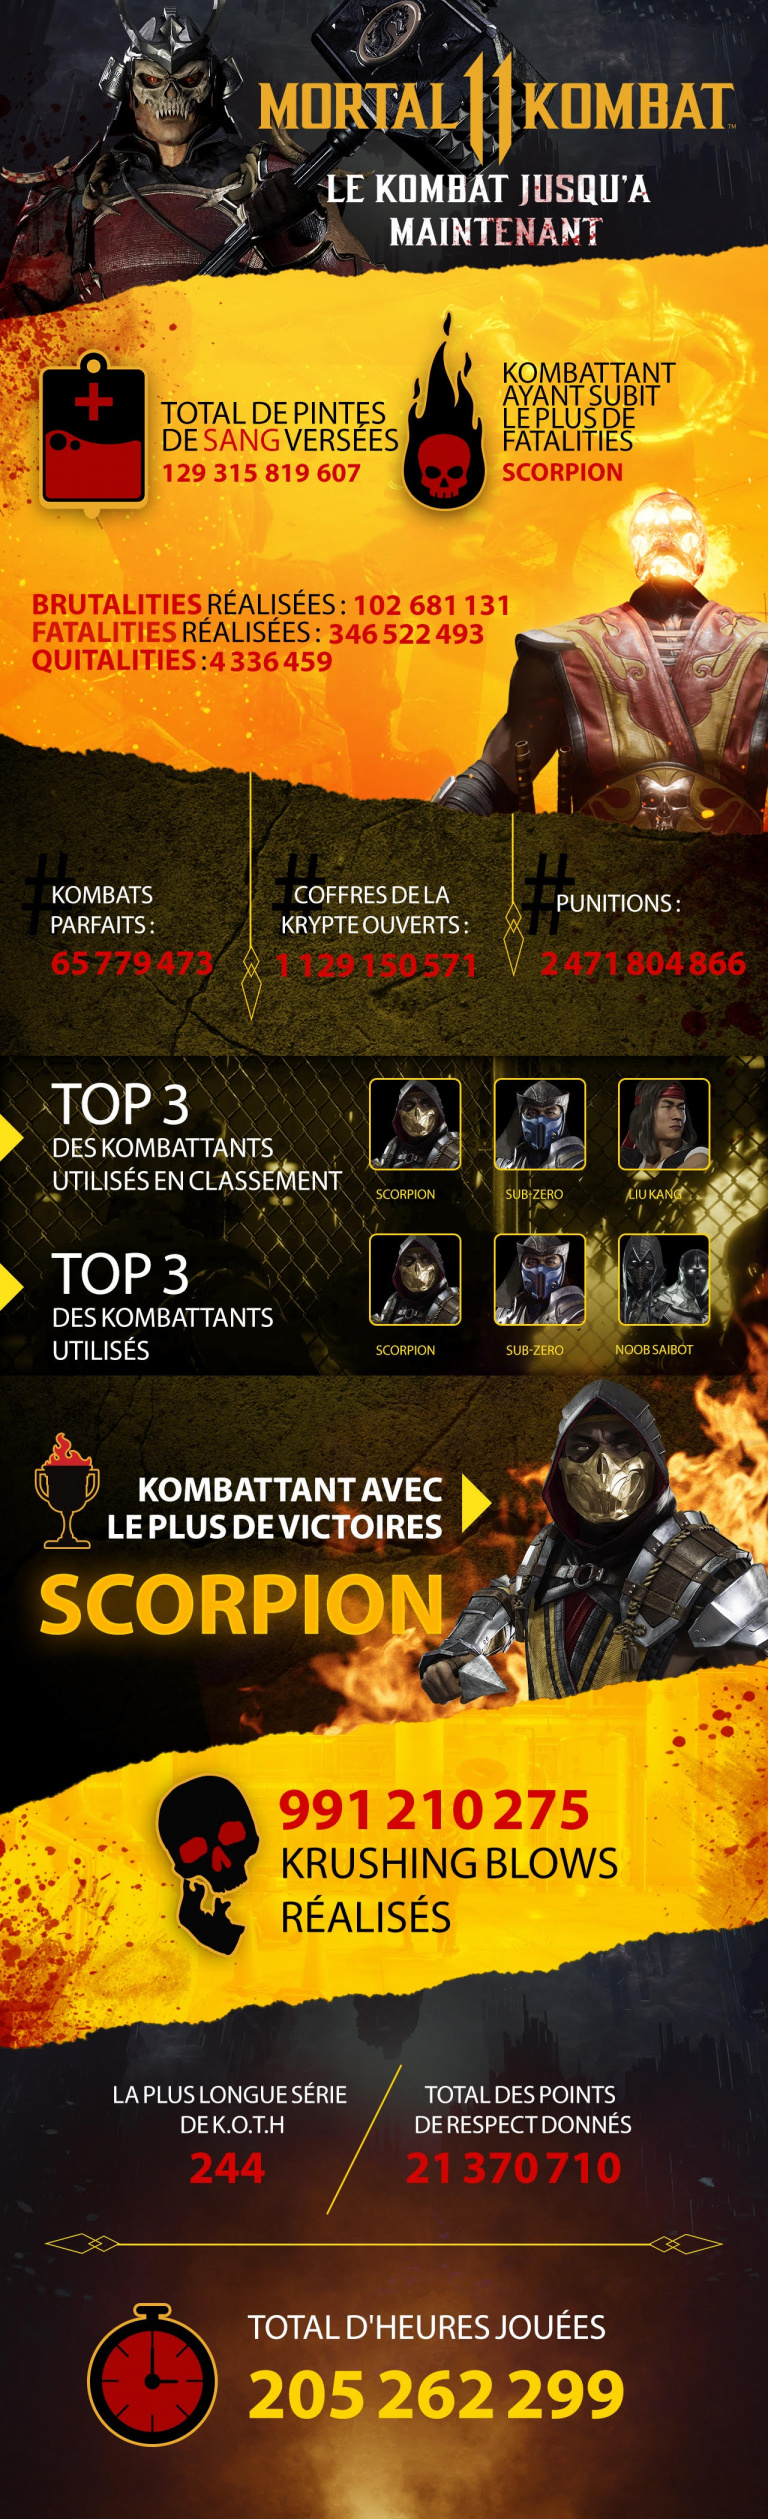 Mortal Kombat 11 fête l'approche de Noël avec des statistiques impressionnantes